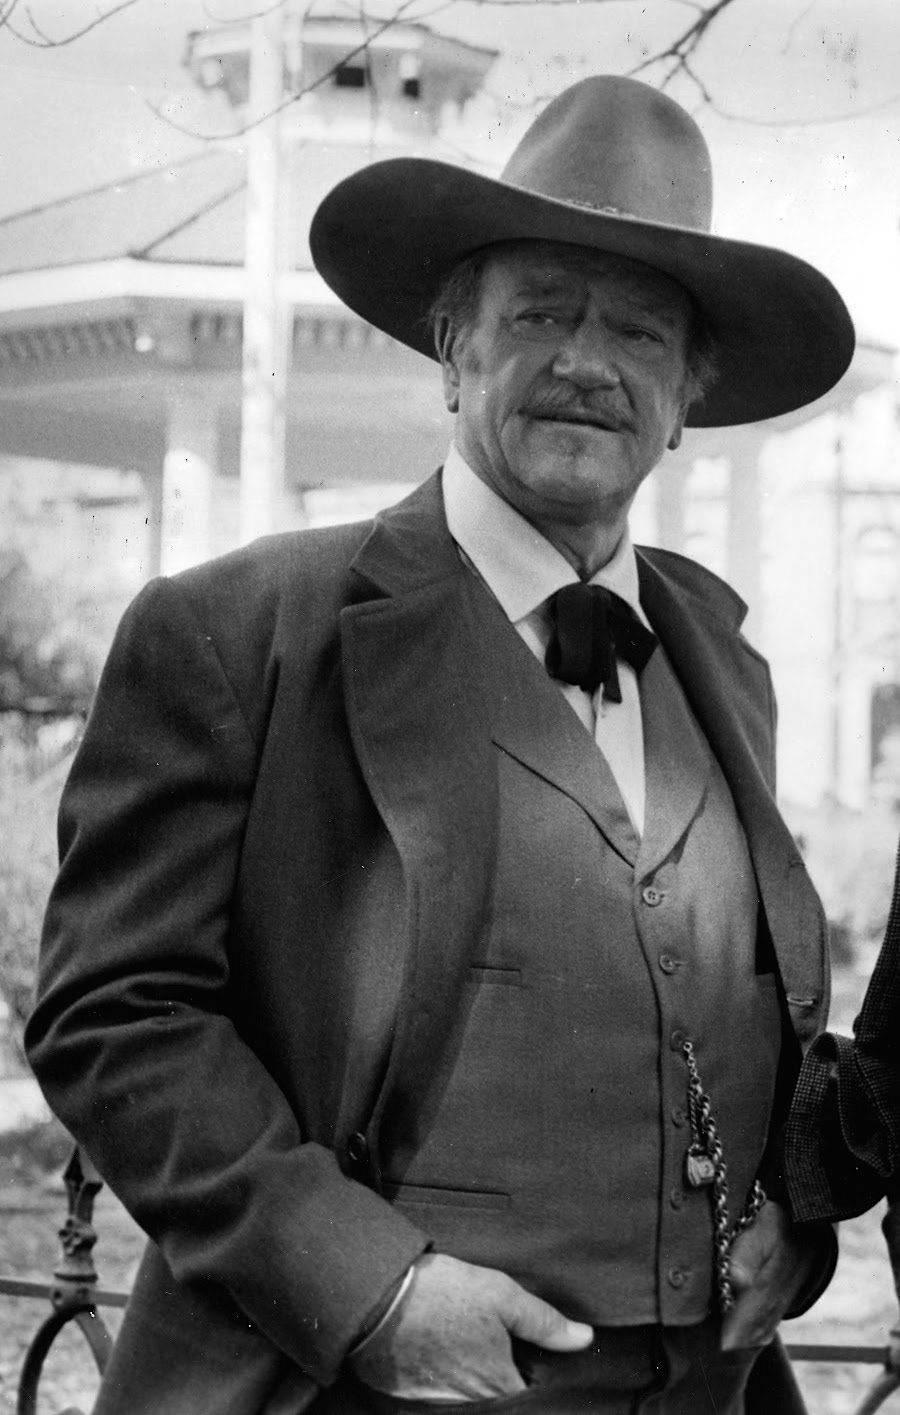 John Wayne in The Shootist – J.B. Books\' Lounge Suit | BAMF Style